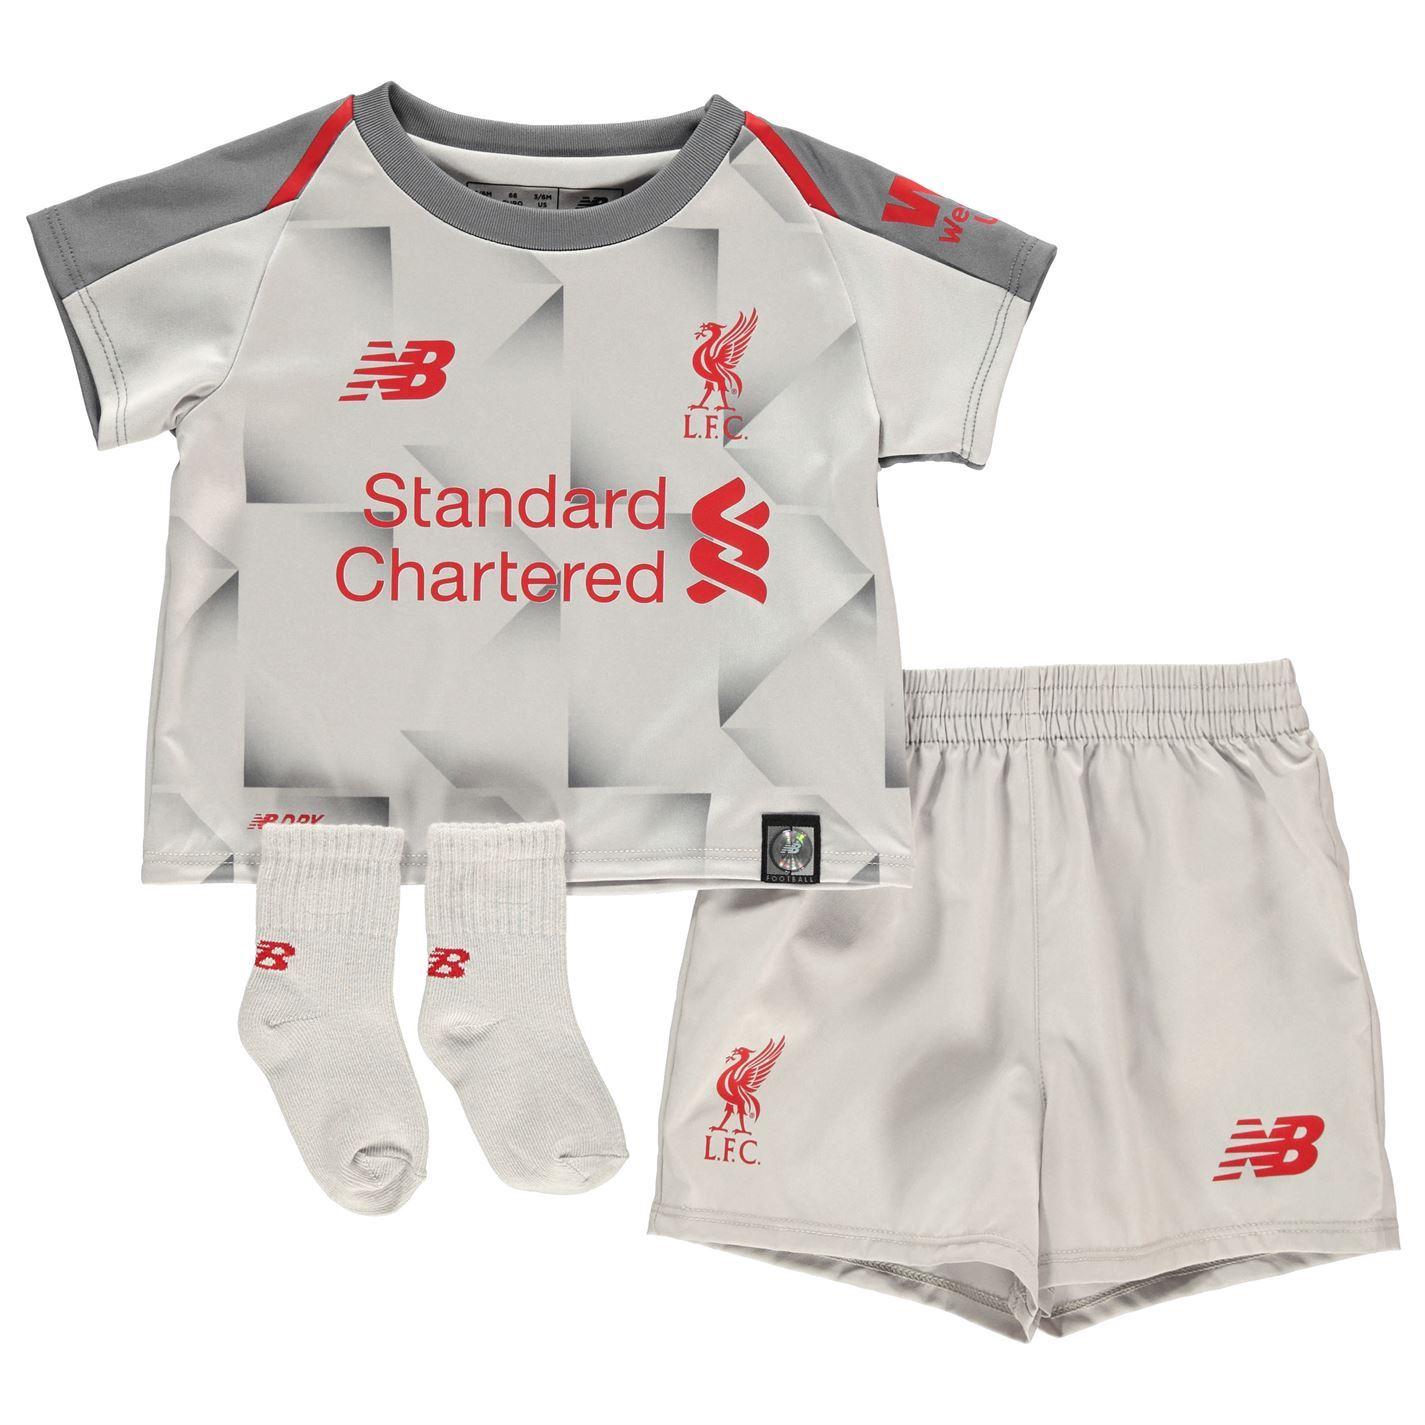 ab21e86a0c7 New Balance Liverpool Third Baby Kit 2018 2019 Childrens Domestic ...